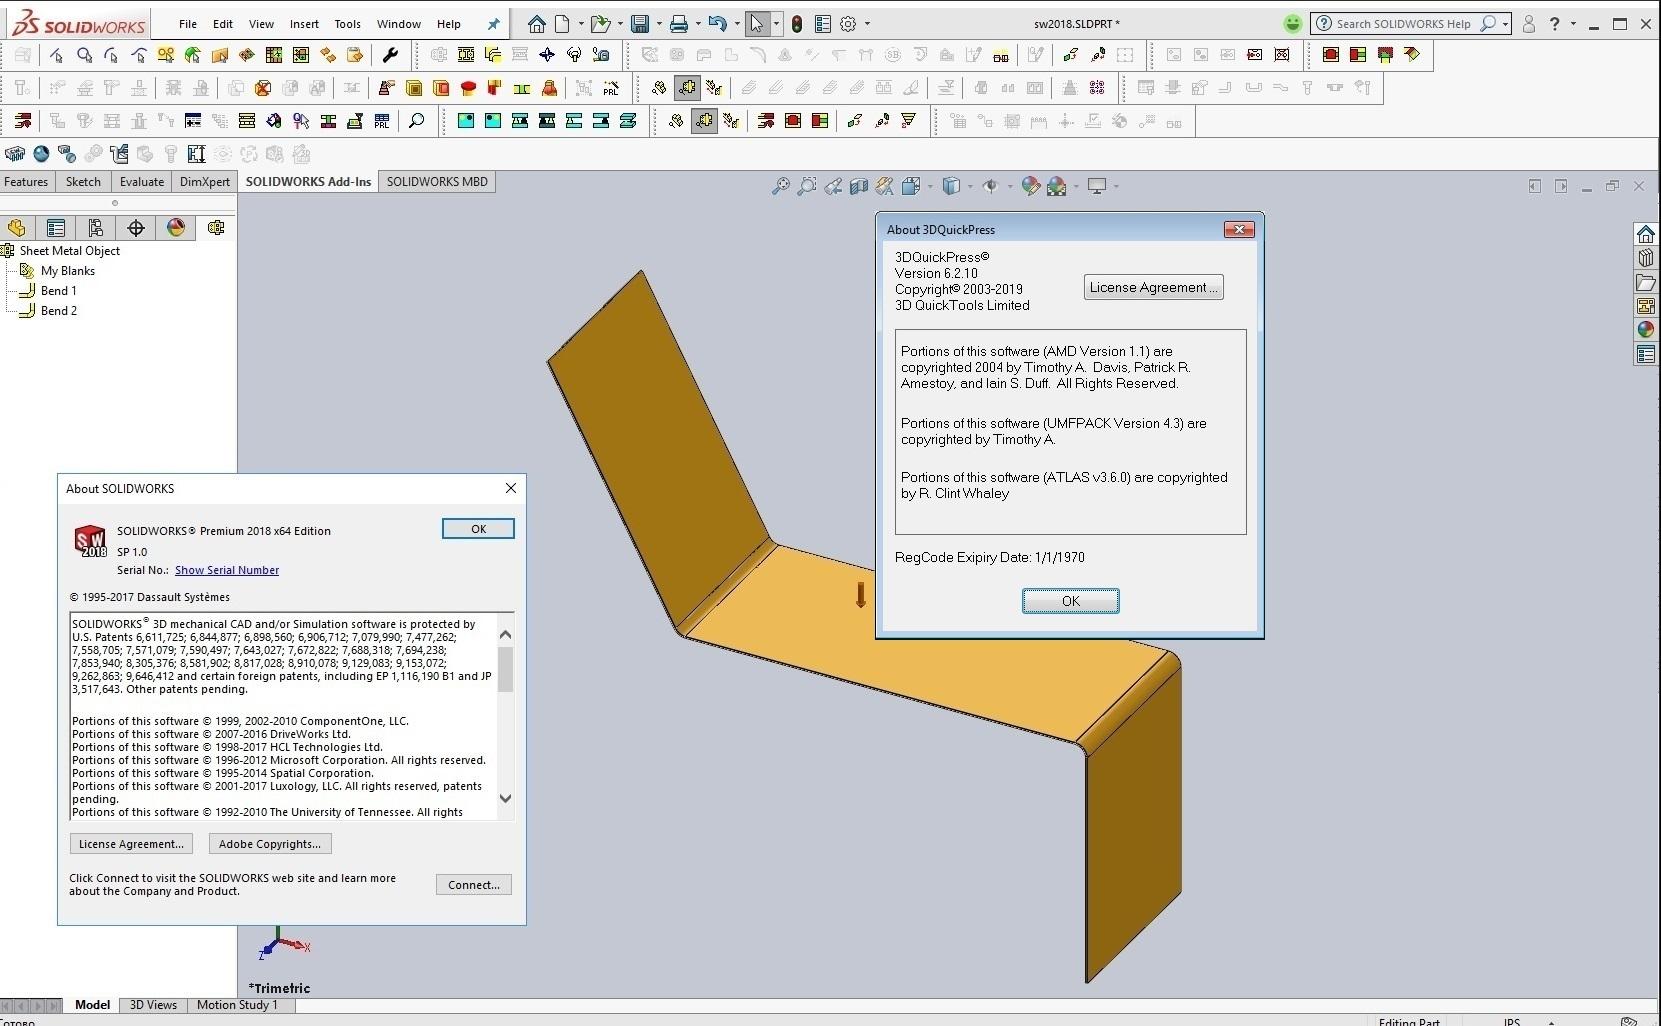 Download 3DQuickPress v6.2.10 for SolidWorks 2012-2019 x64 full license